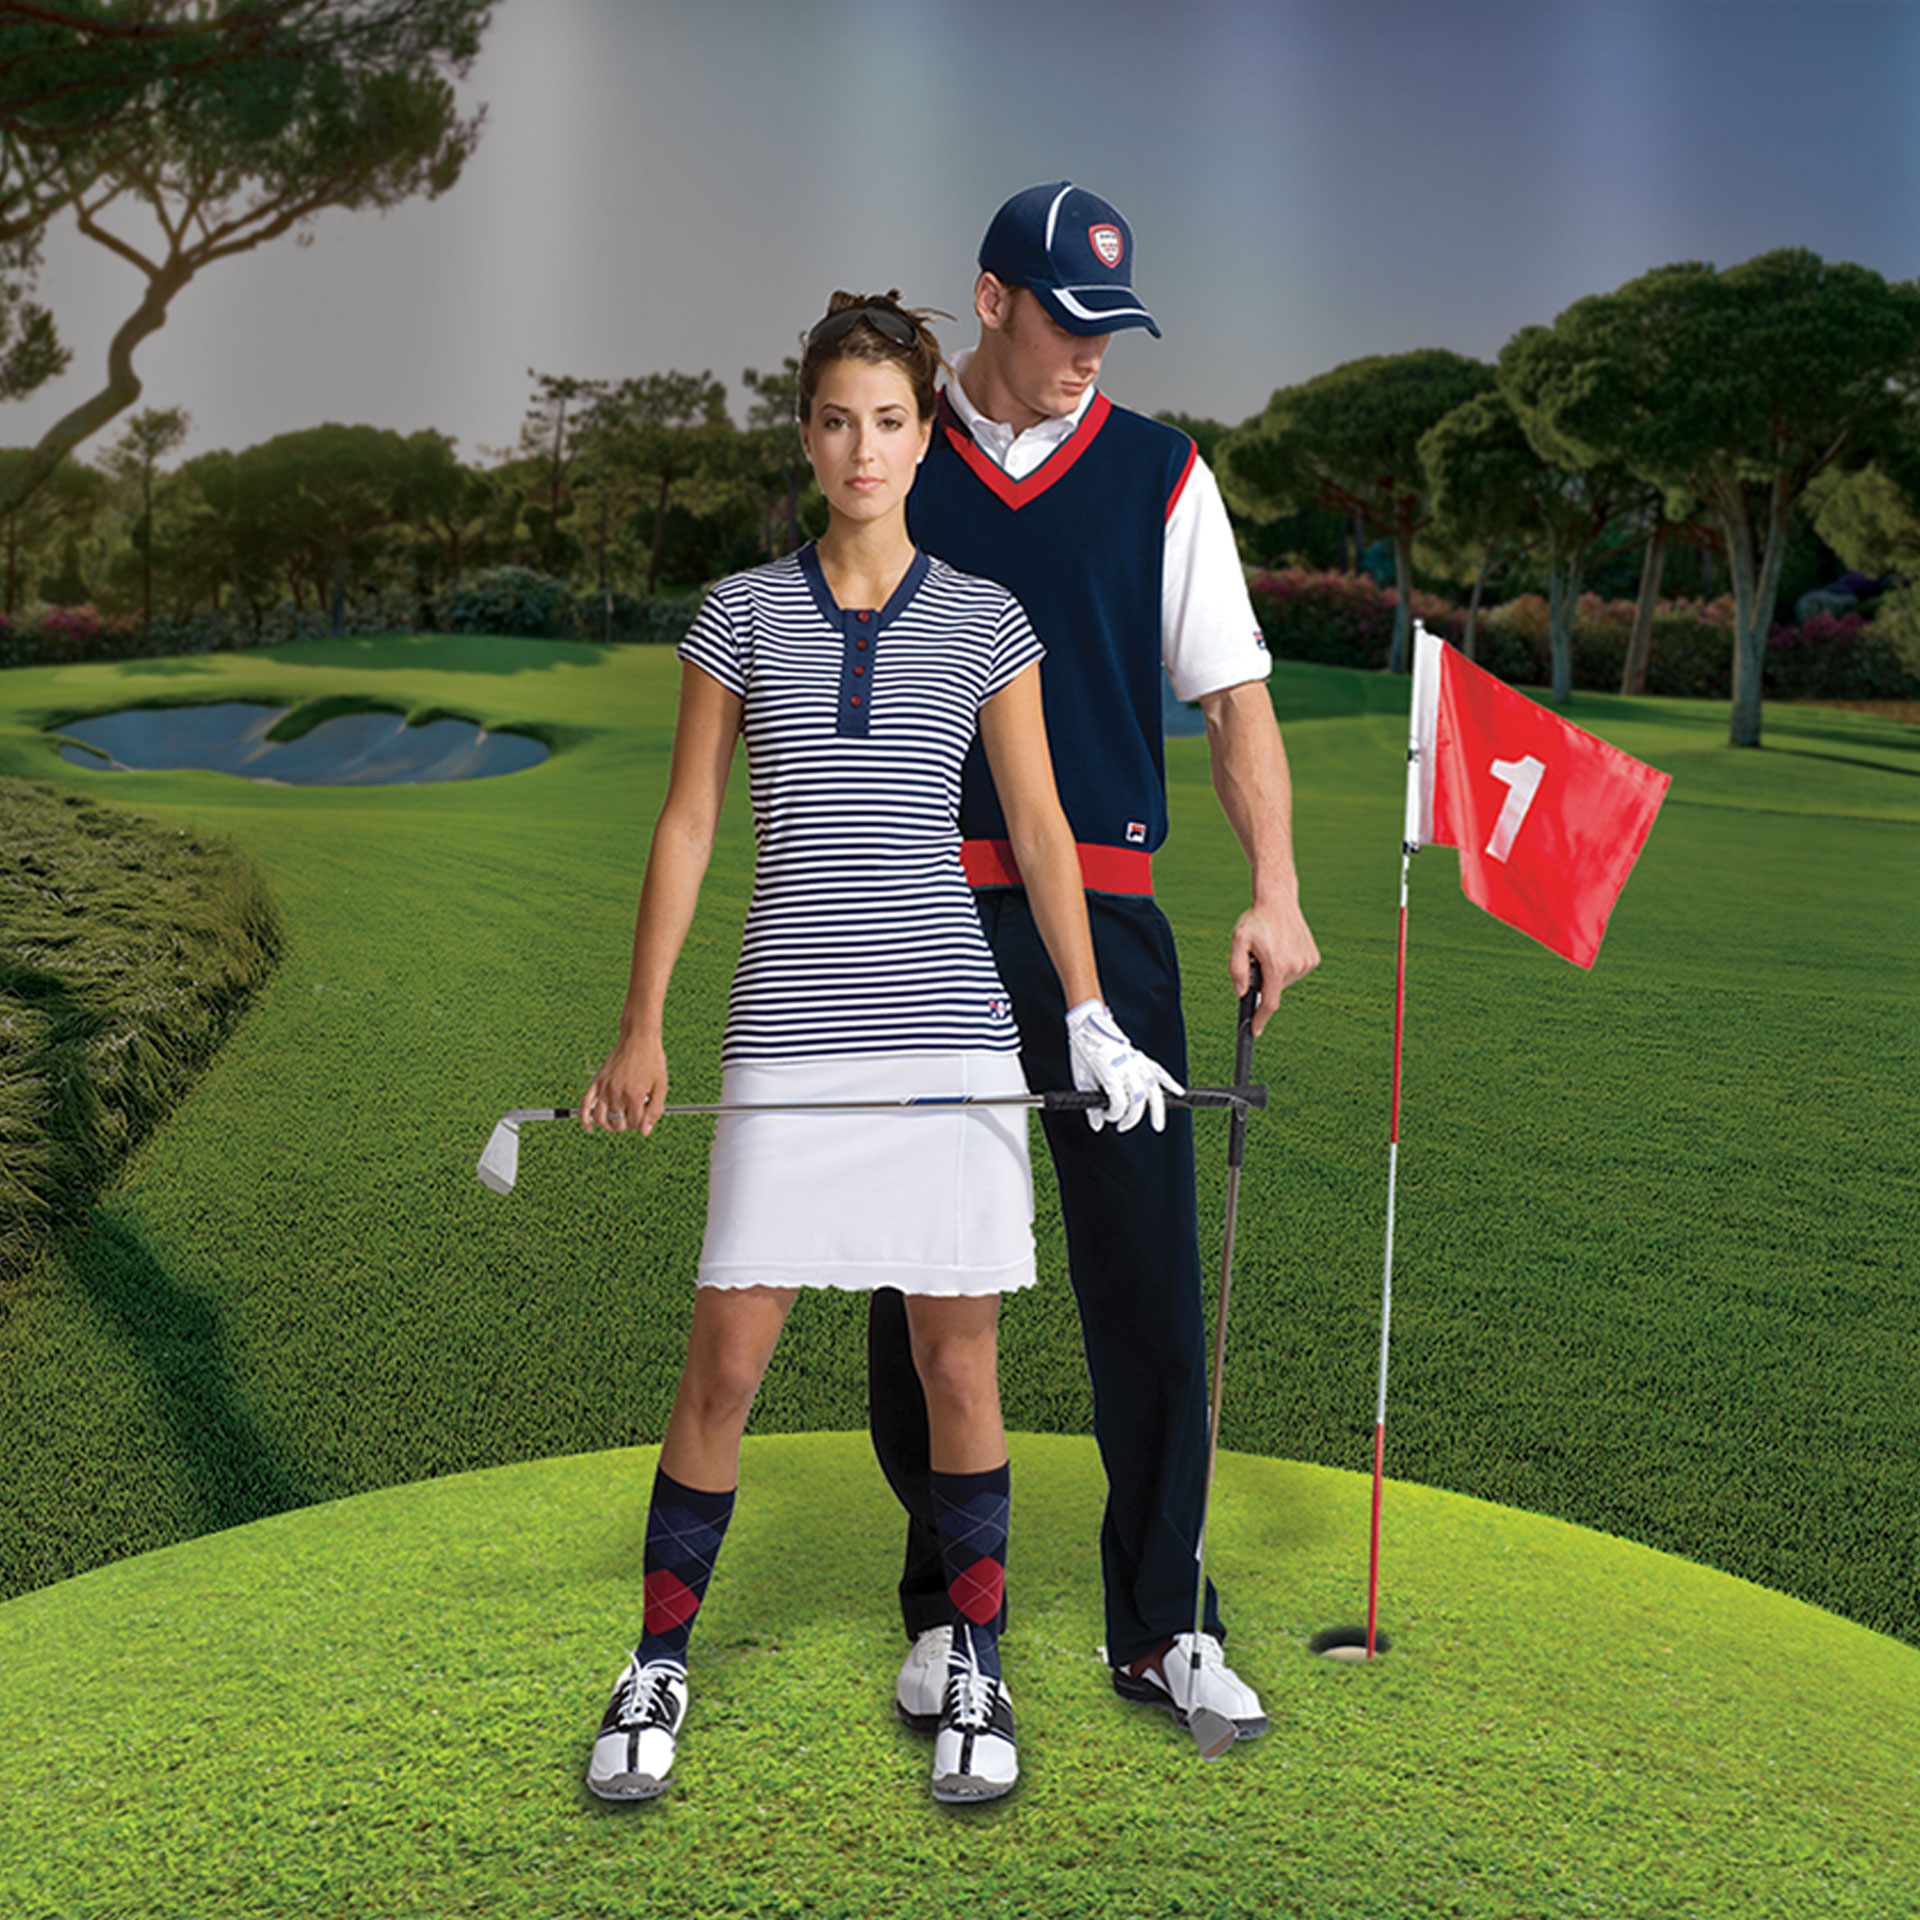 Dizajn i brendiranje izloga za Golfland Shop & Tour